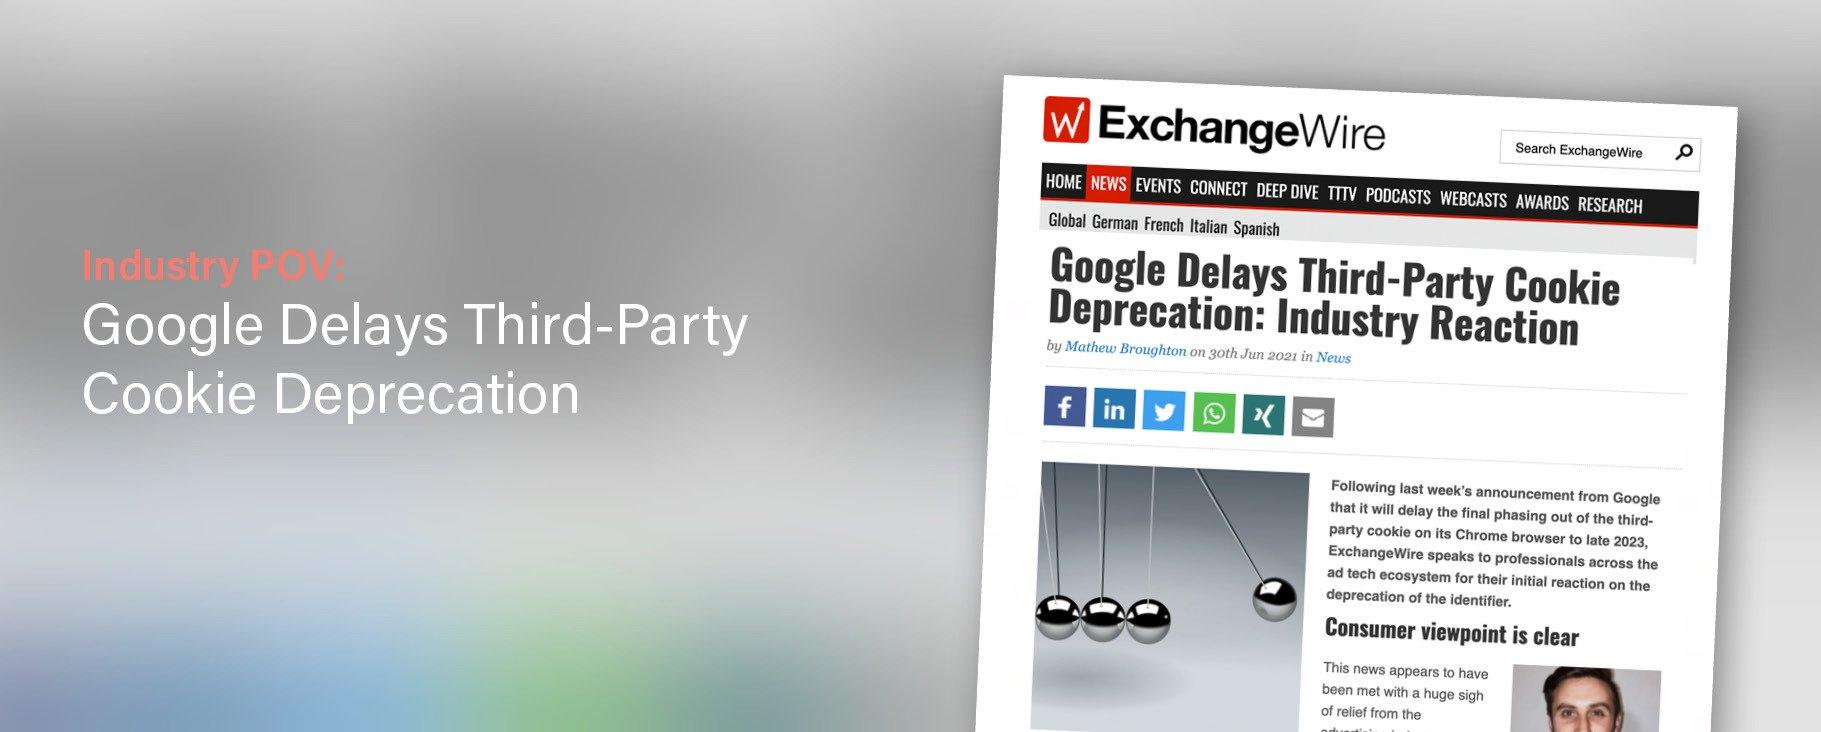 ExchangeWire: Google Delays Third-Party Cookie Deprecation—Industry Reaction